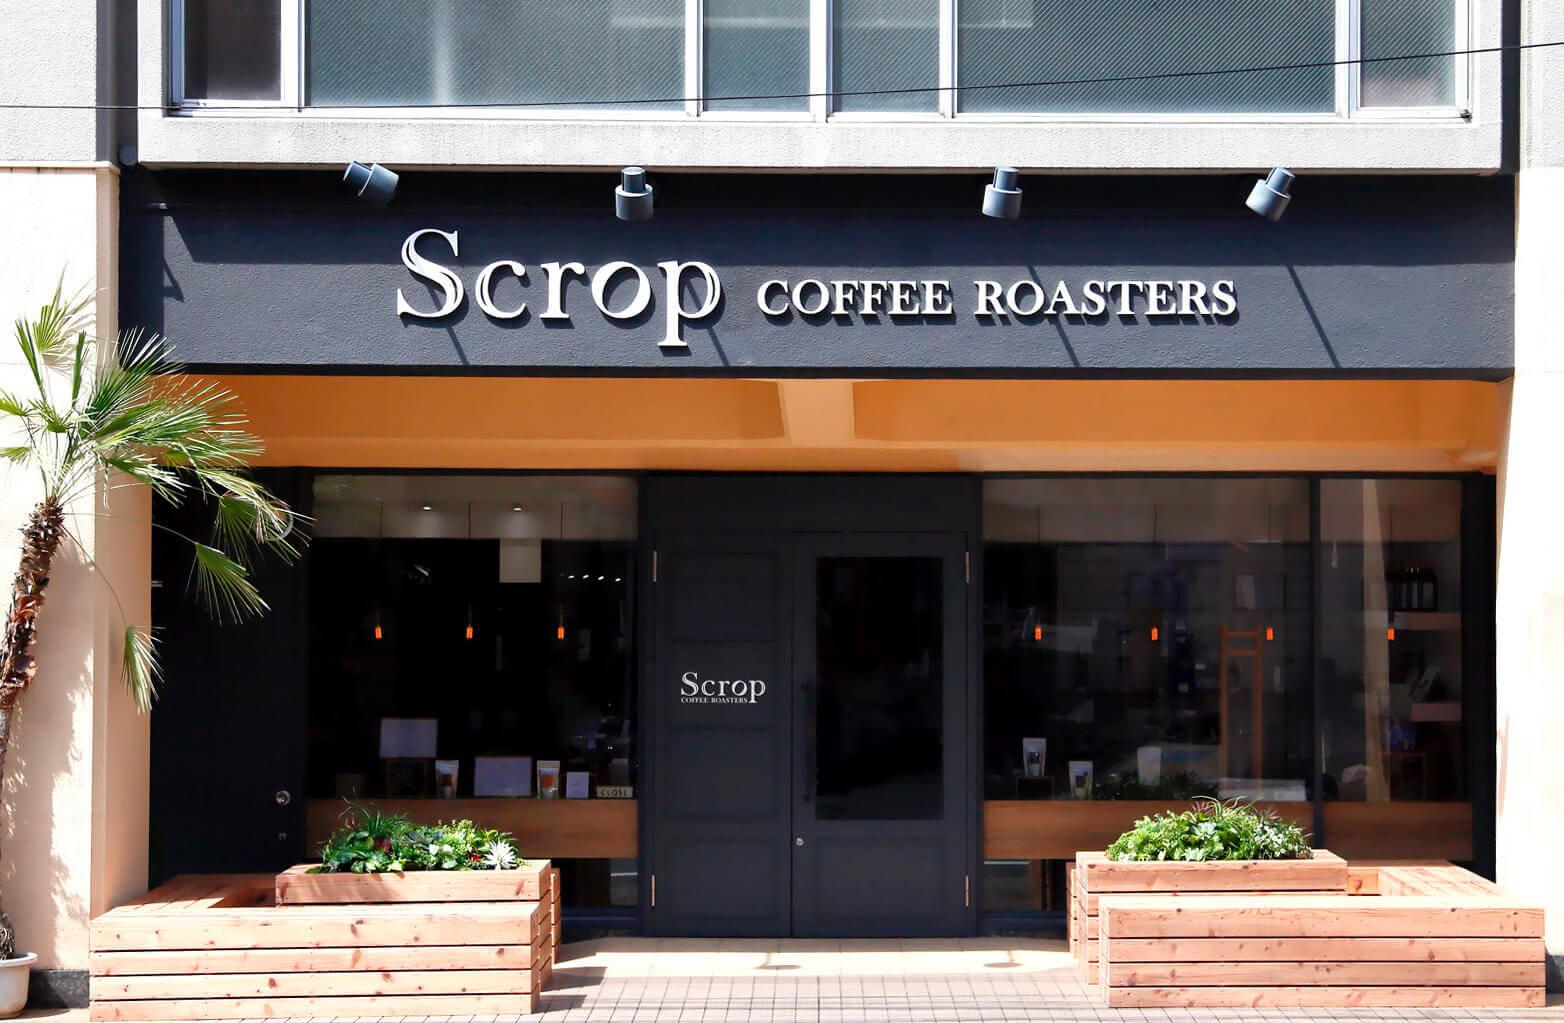 Scrop COFFEE ROASTERS(スクロップ コーヒー ロースターズ )の外観